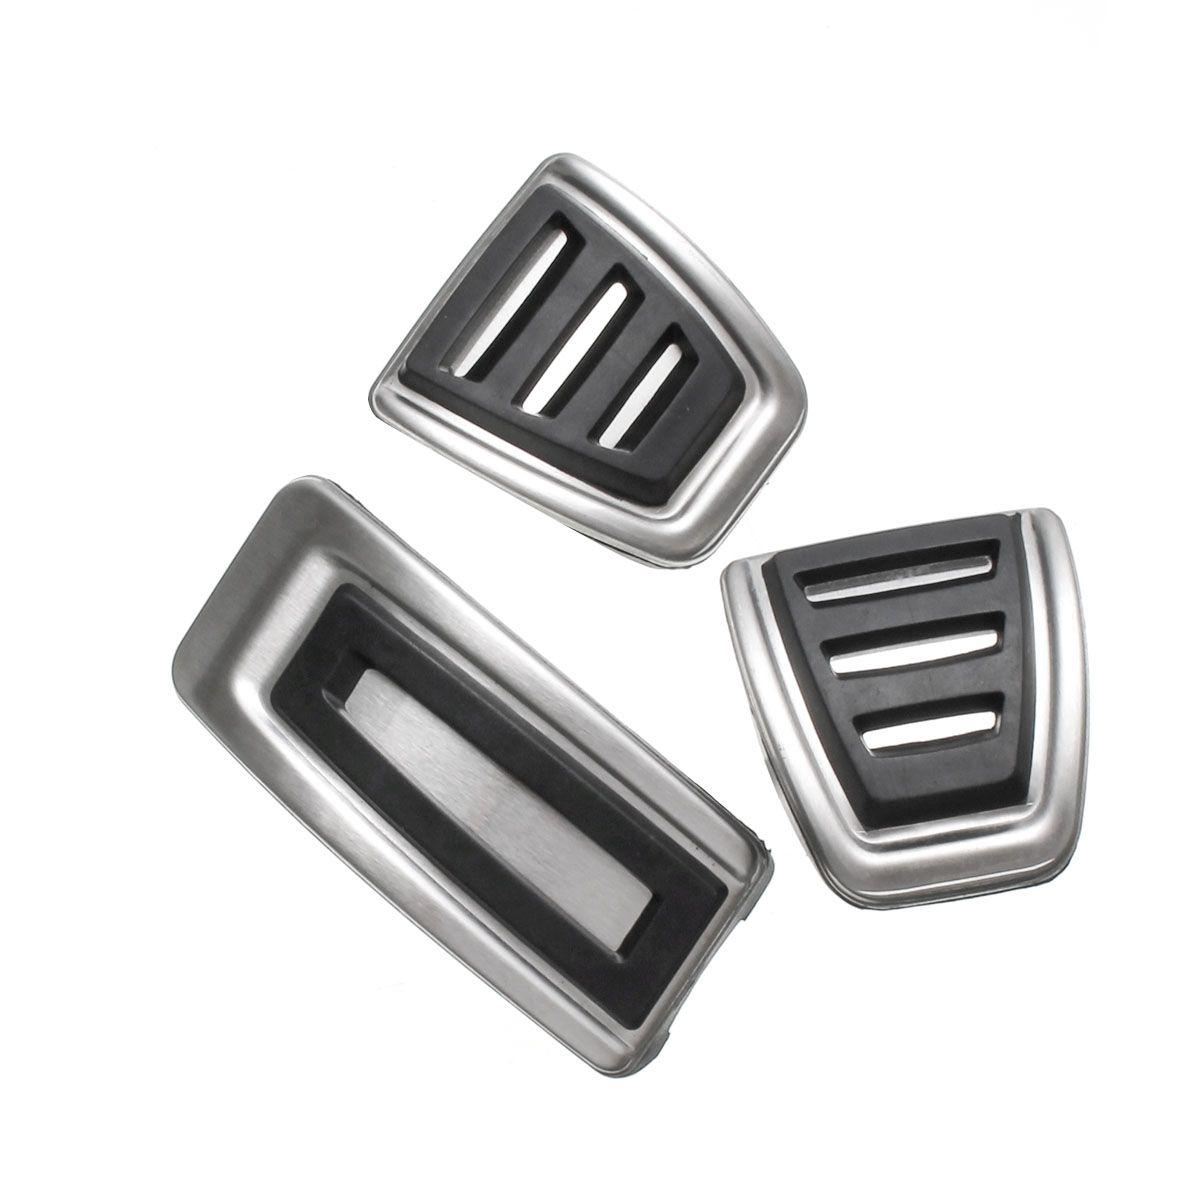 3 teile/satz Auto Kupplung Bremse Gaspedal Fußstütze Pad Abdeckungen Für Sitz/Skoda/Fabia/VW/Polo 9N 6R/Bora/Golf MK4 IV